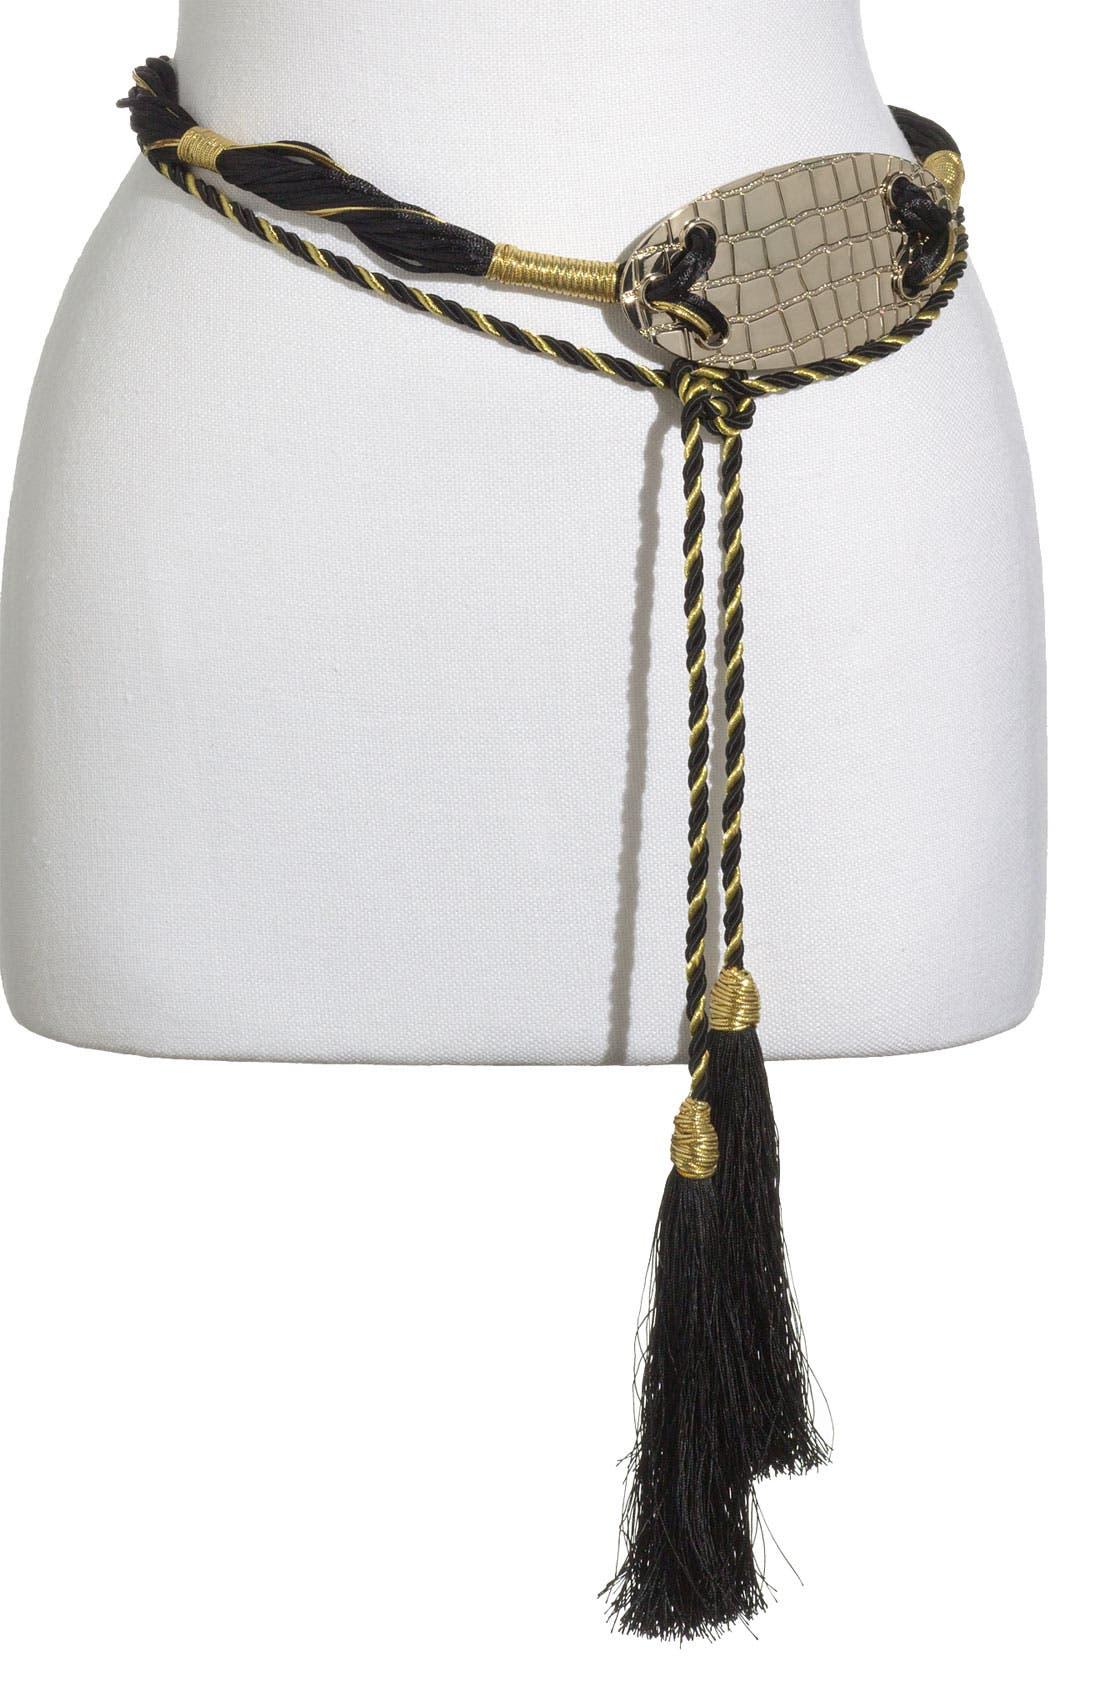 Main Image - Raina 'The Croco' Rope Belt